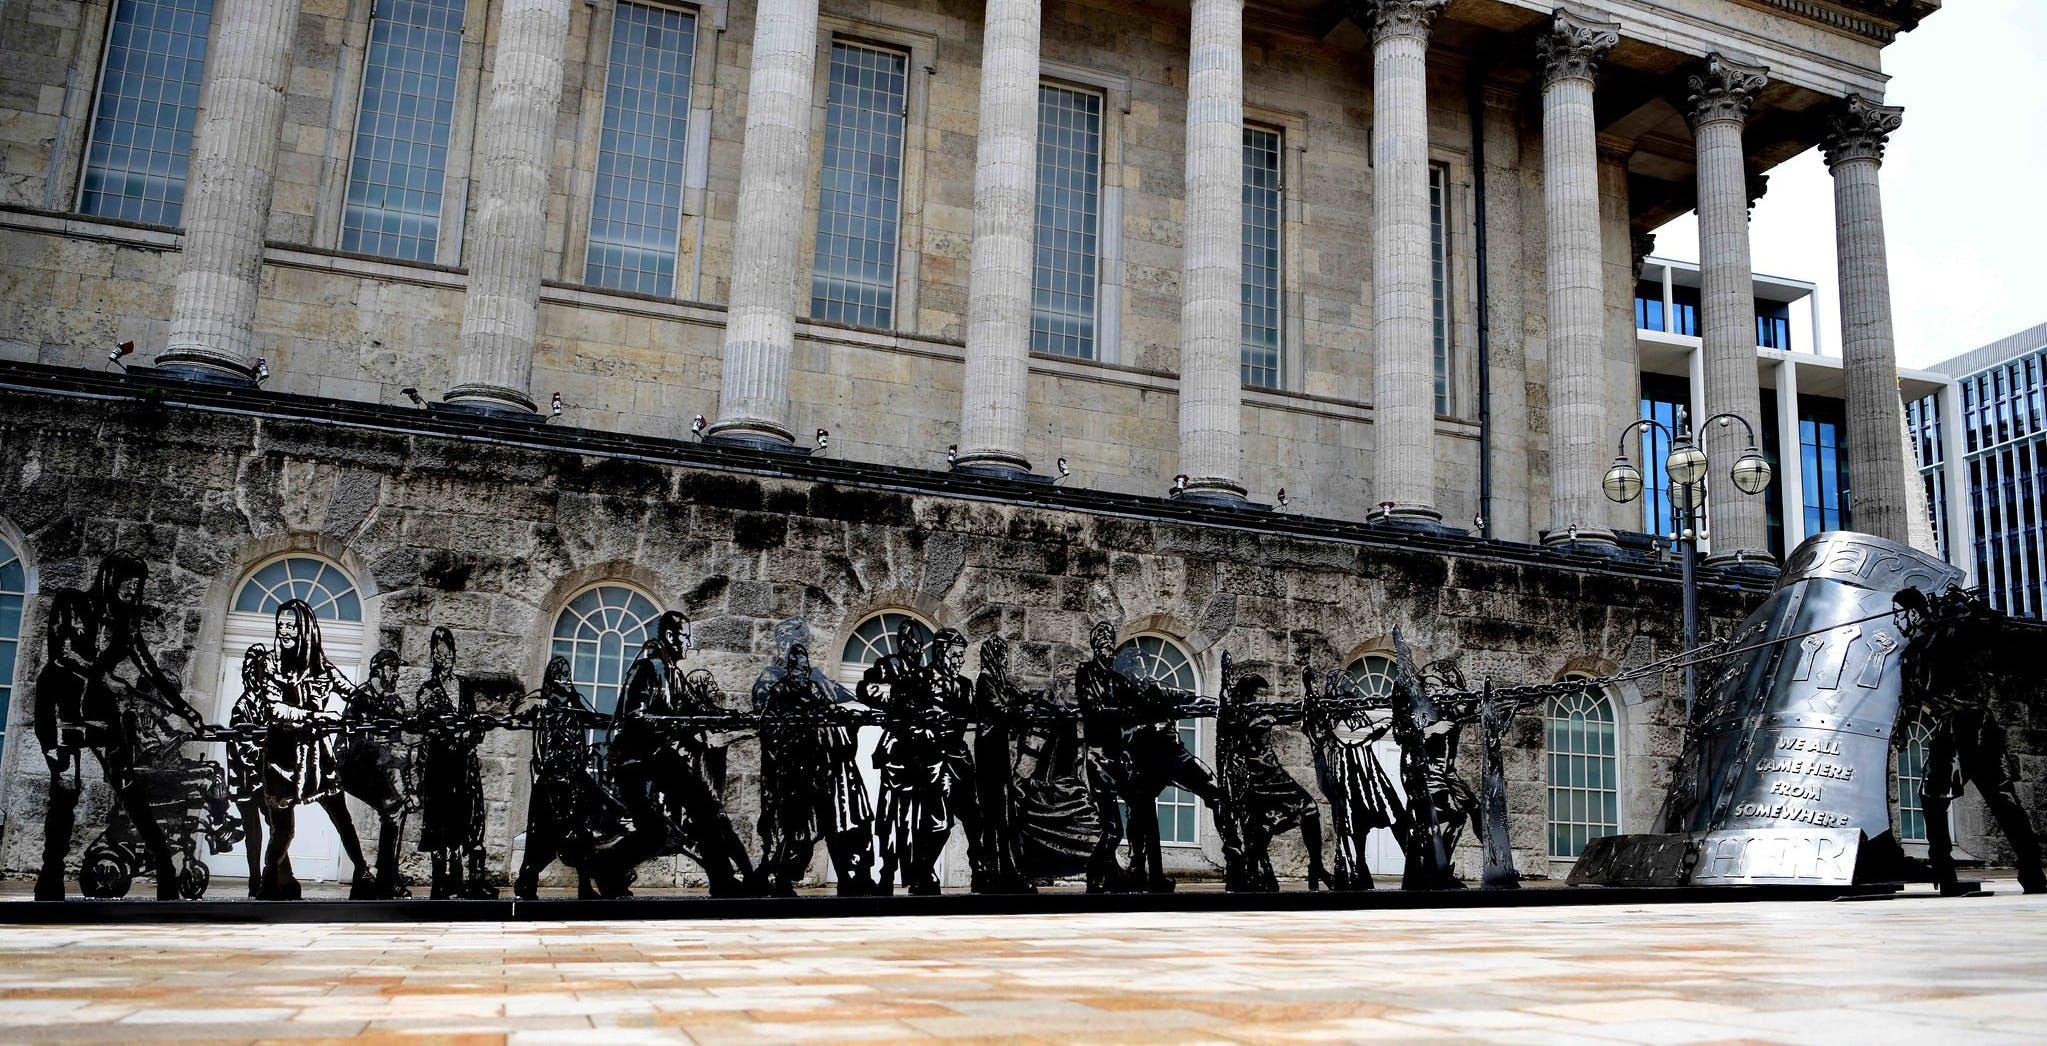 Image of Birmingham city centre art installation, featuring black metal sculptures